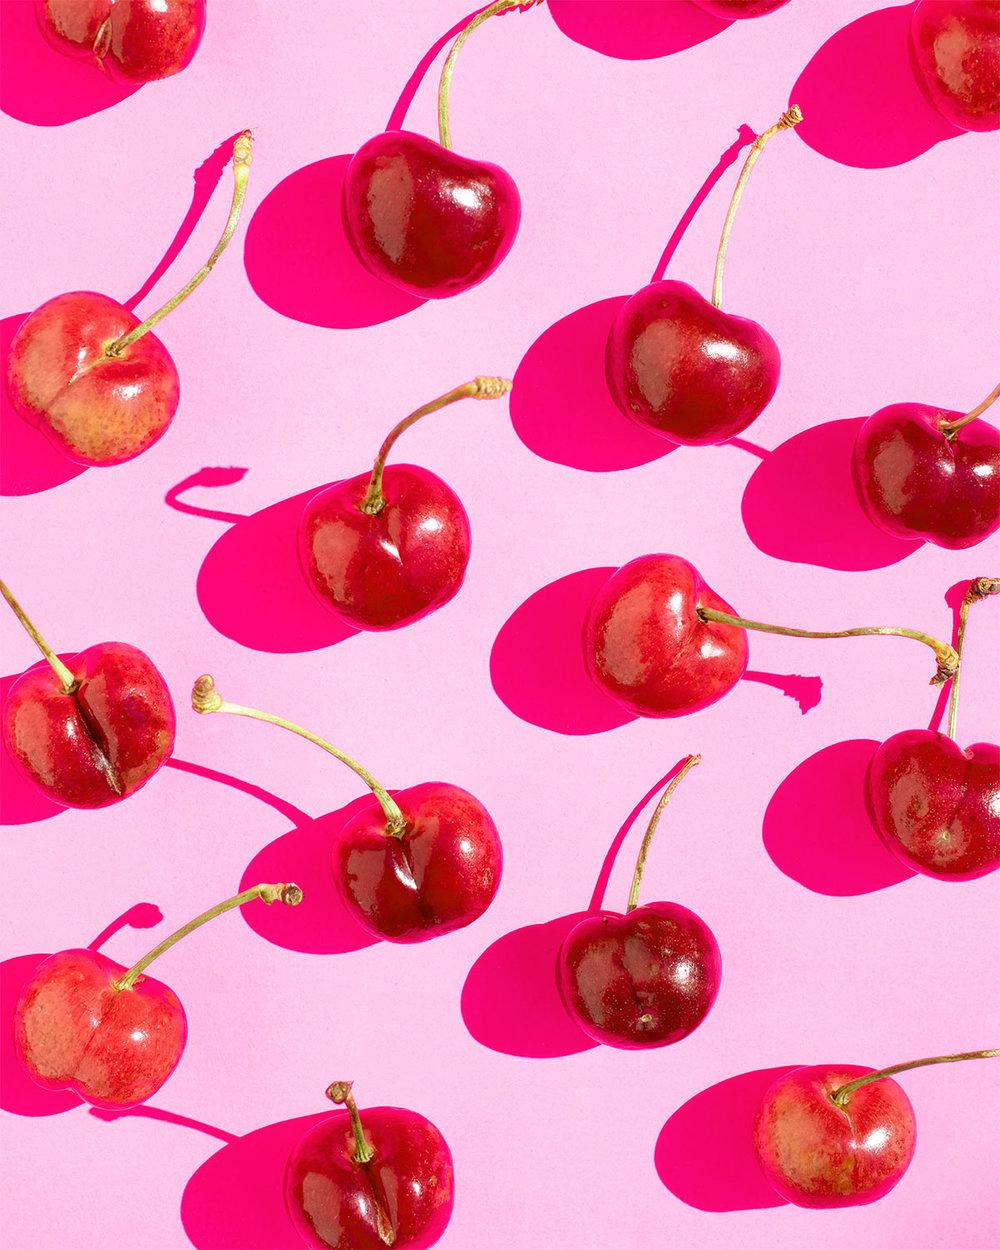 cherry_pattern.jpg